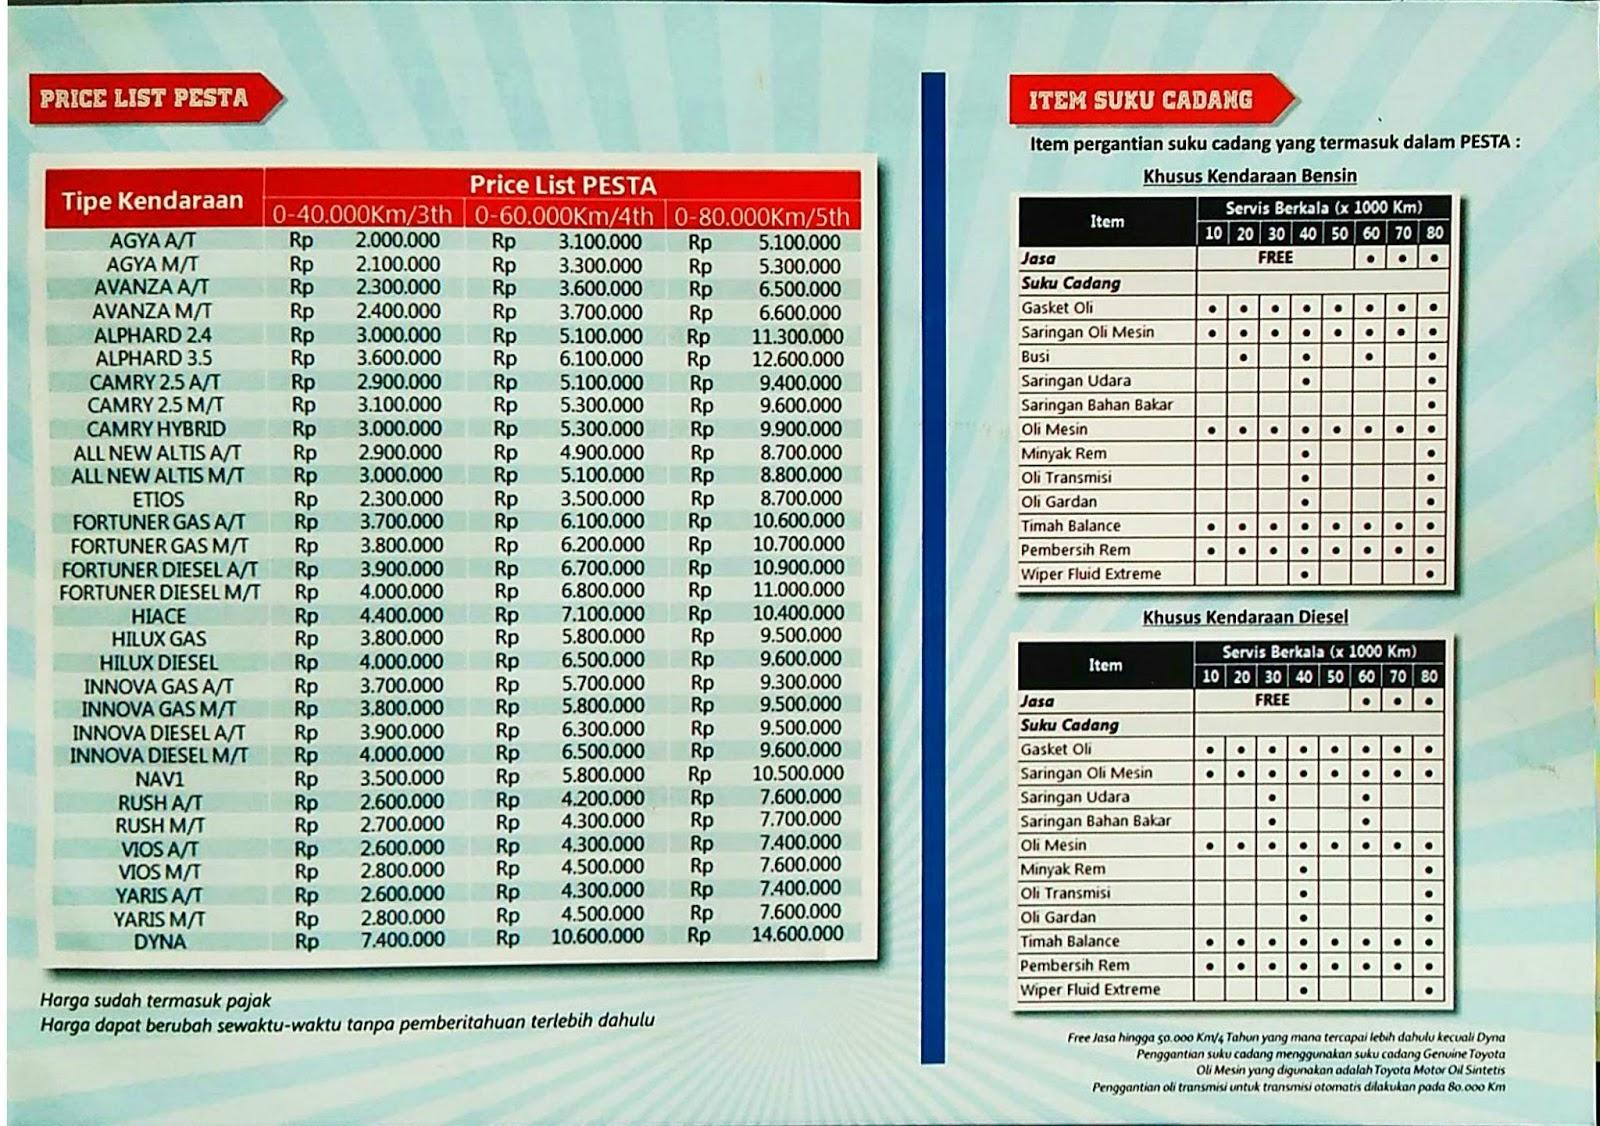 Rekomendasi Oli Grand New Avanza All Kijang Innova Beli Mobil Bebas Biaya Servis Paket Service Toyota 2015